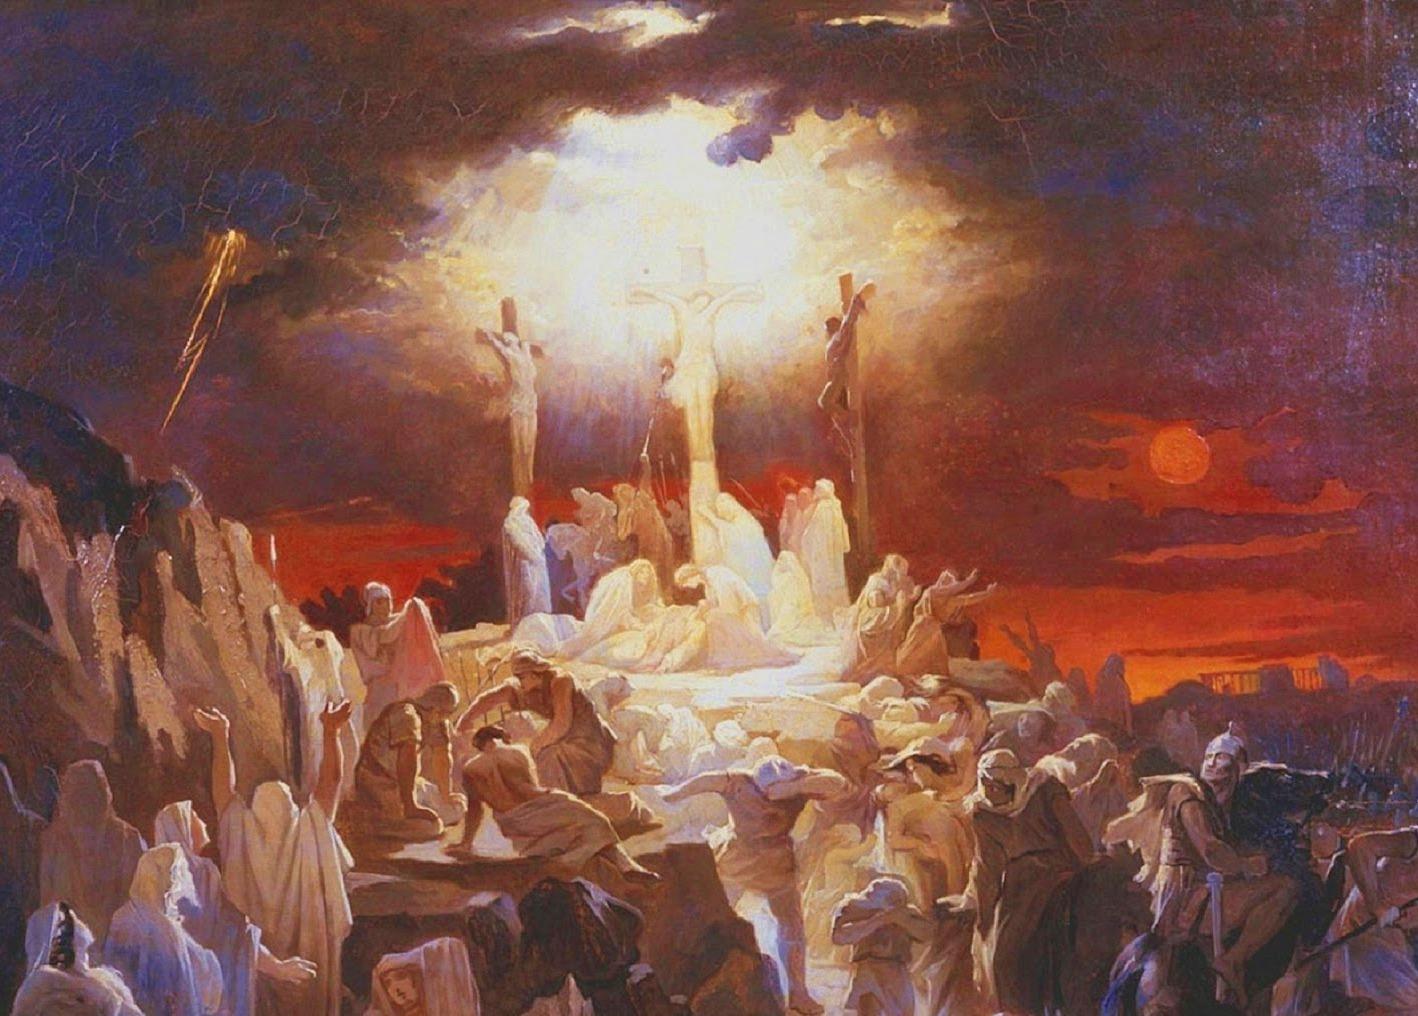 Sermon for Transfiguration/ Vicar James Preus/ Mount Olive Lutheran Church/ Jesus Shines His Glory On Us Through His Cross - Image 1